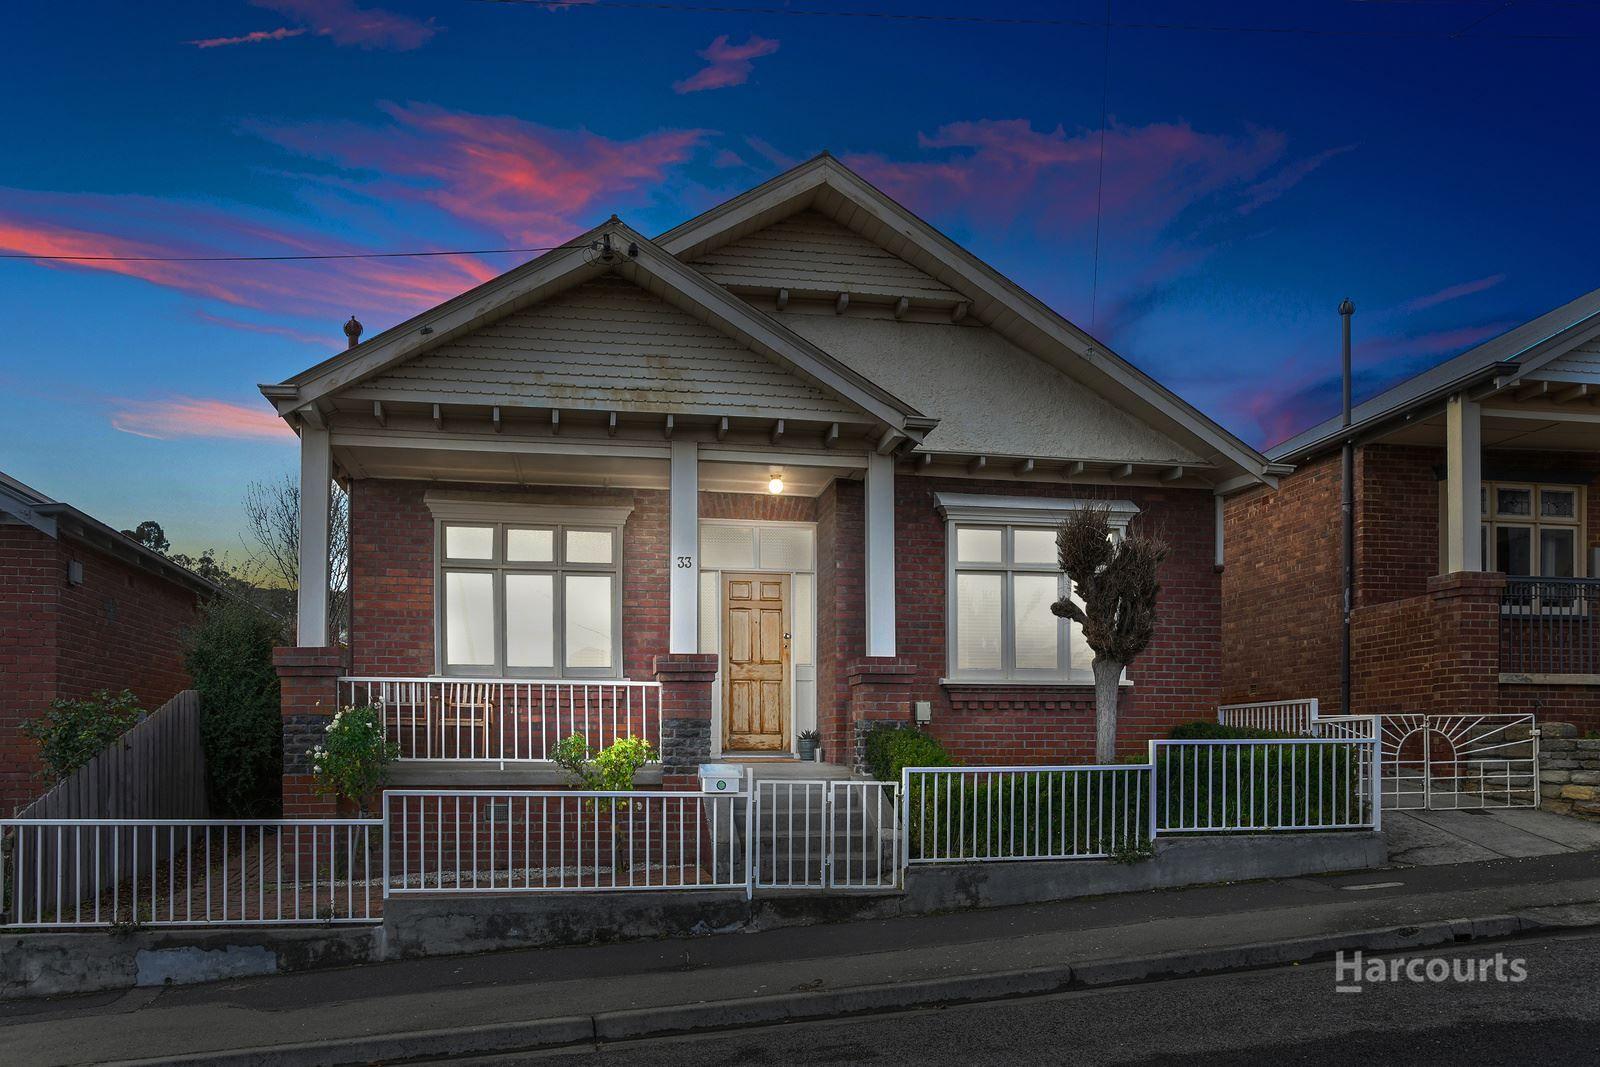 3 bedrooms House in 33 Fraser Street NEW TOWN TAS, 7008